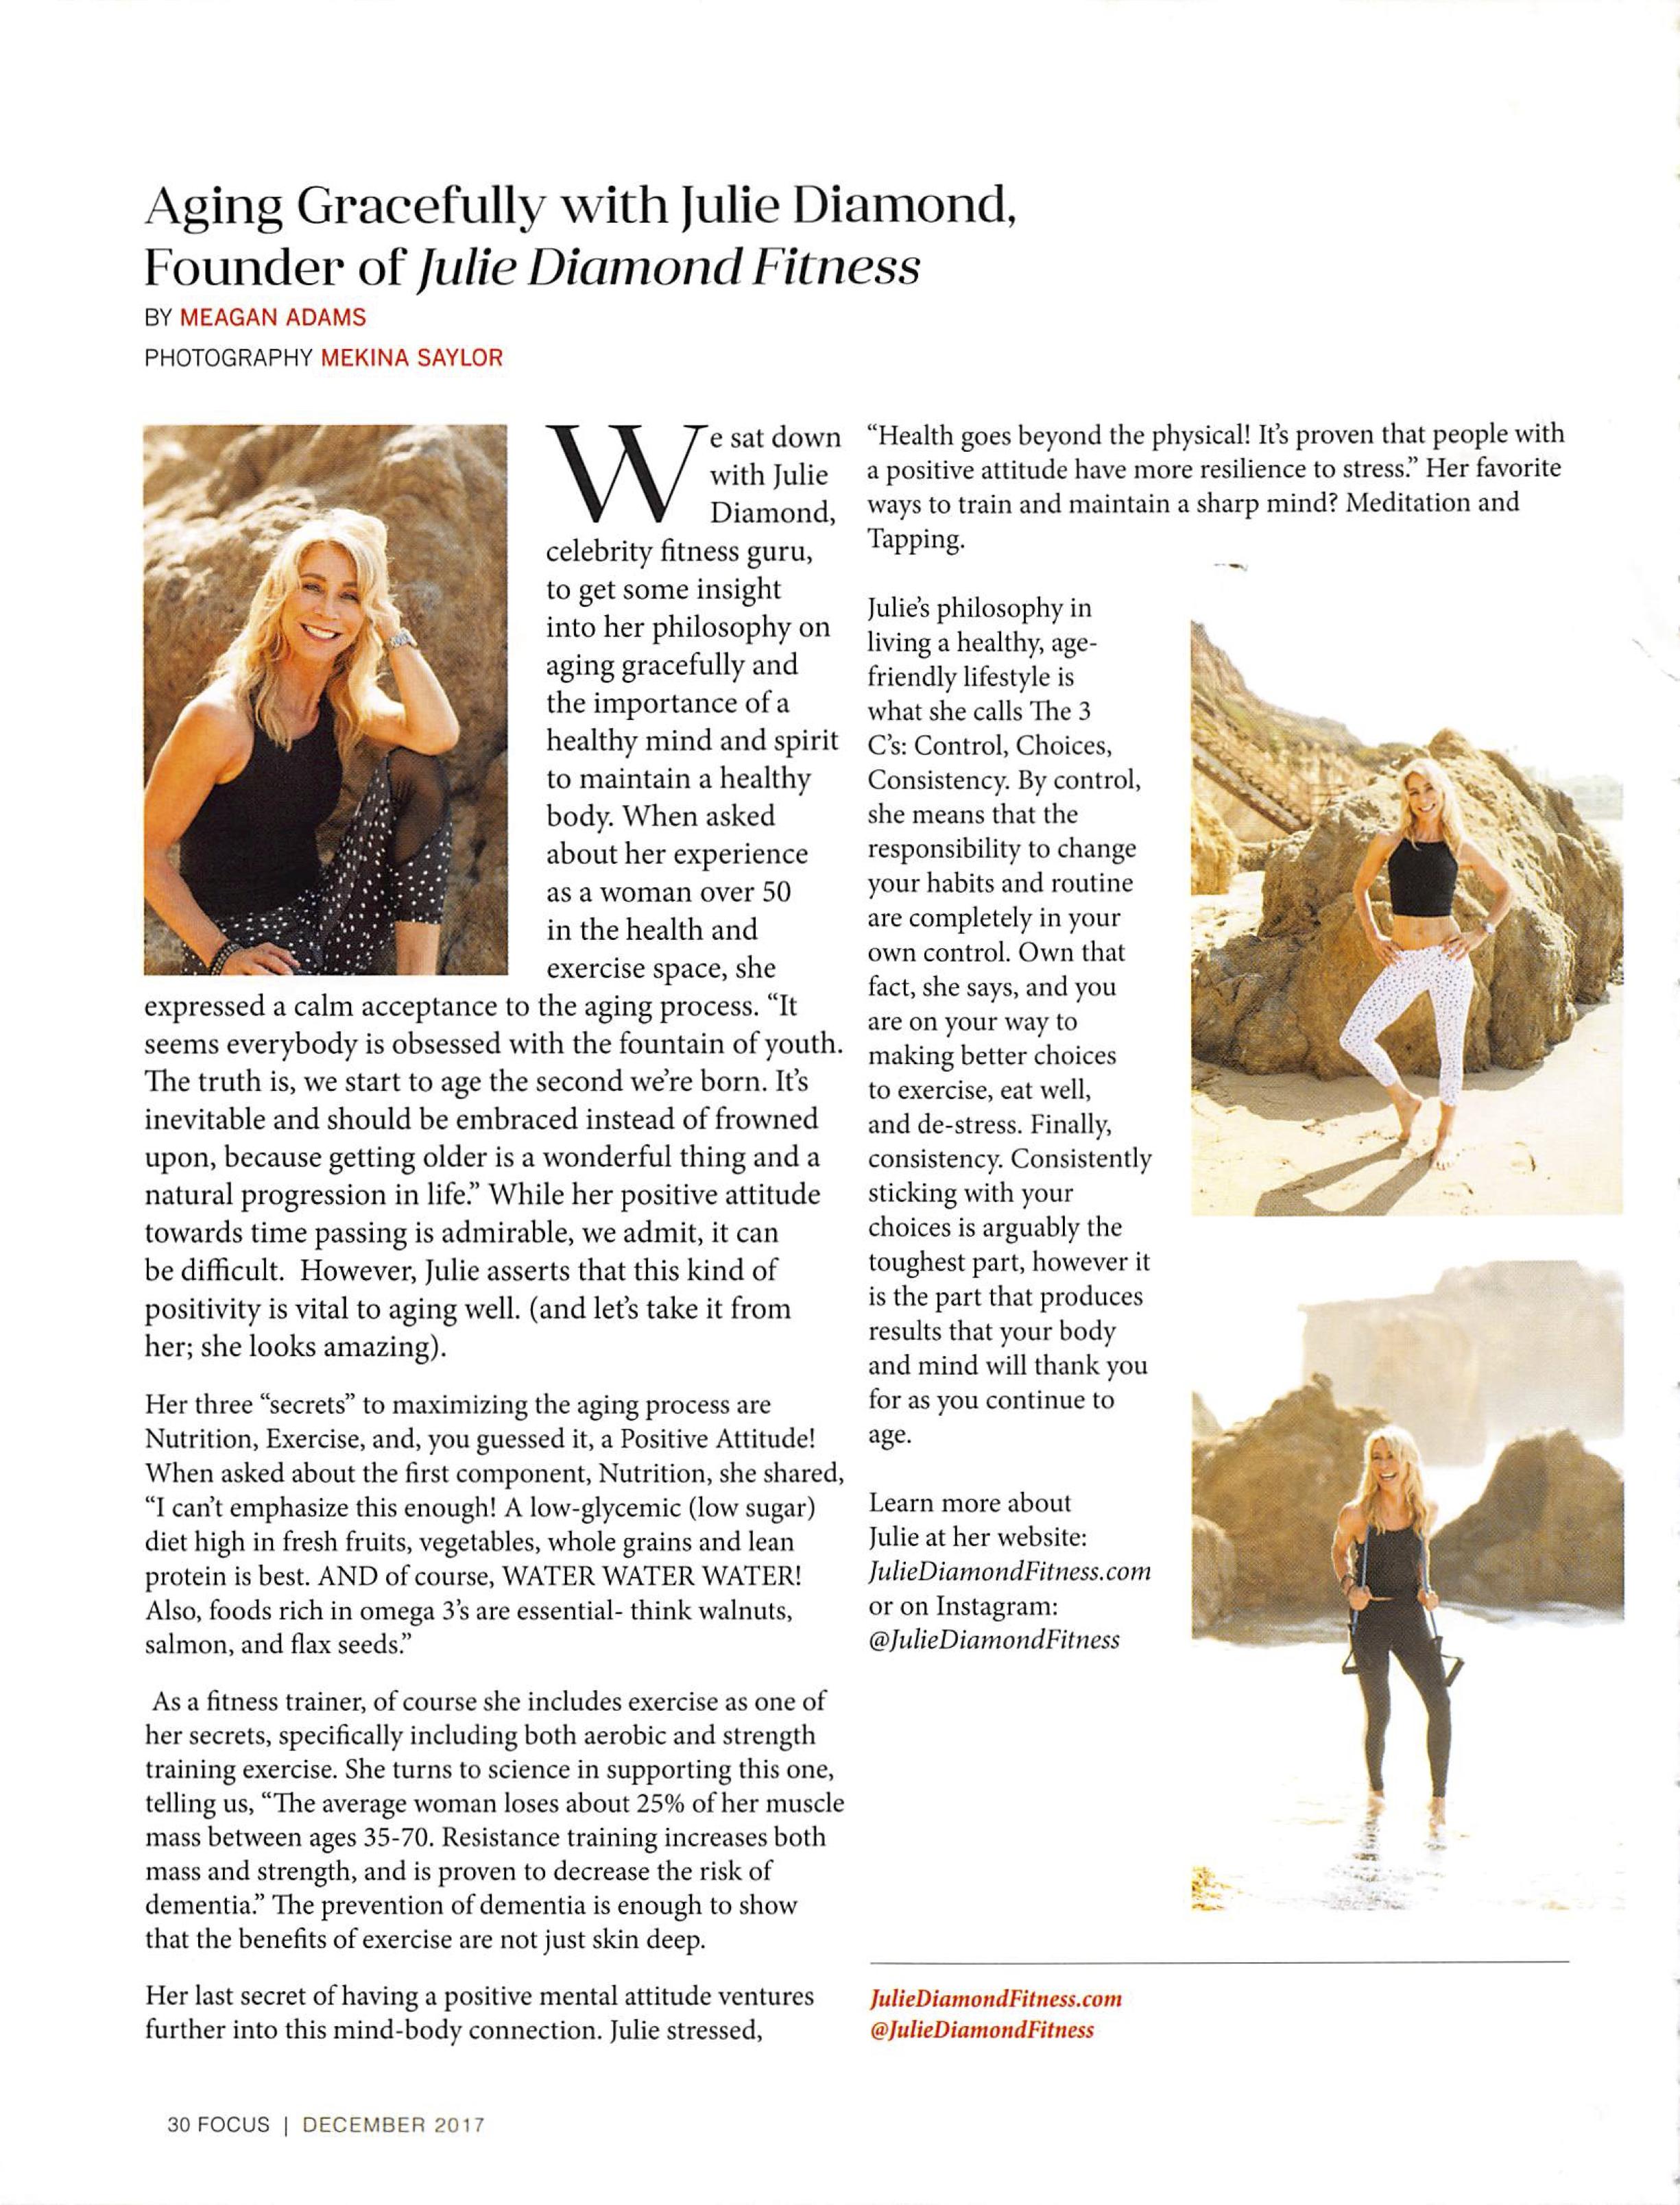 Julie Diamond Focus Magazine 11.17.jpg